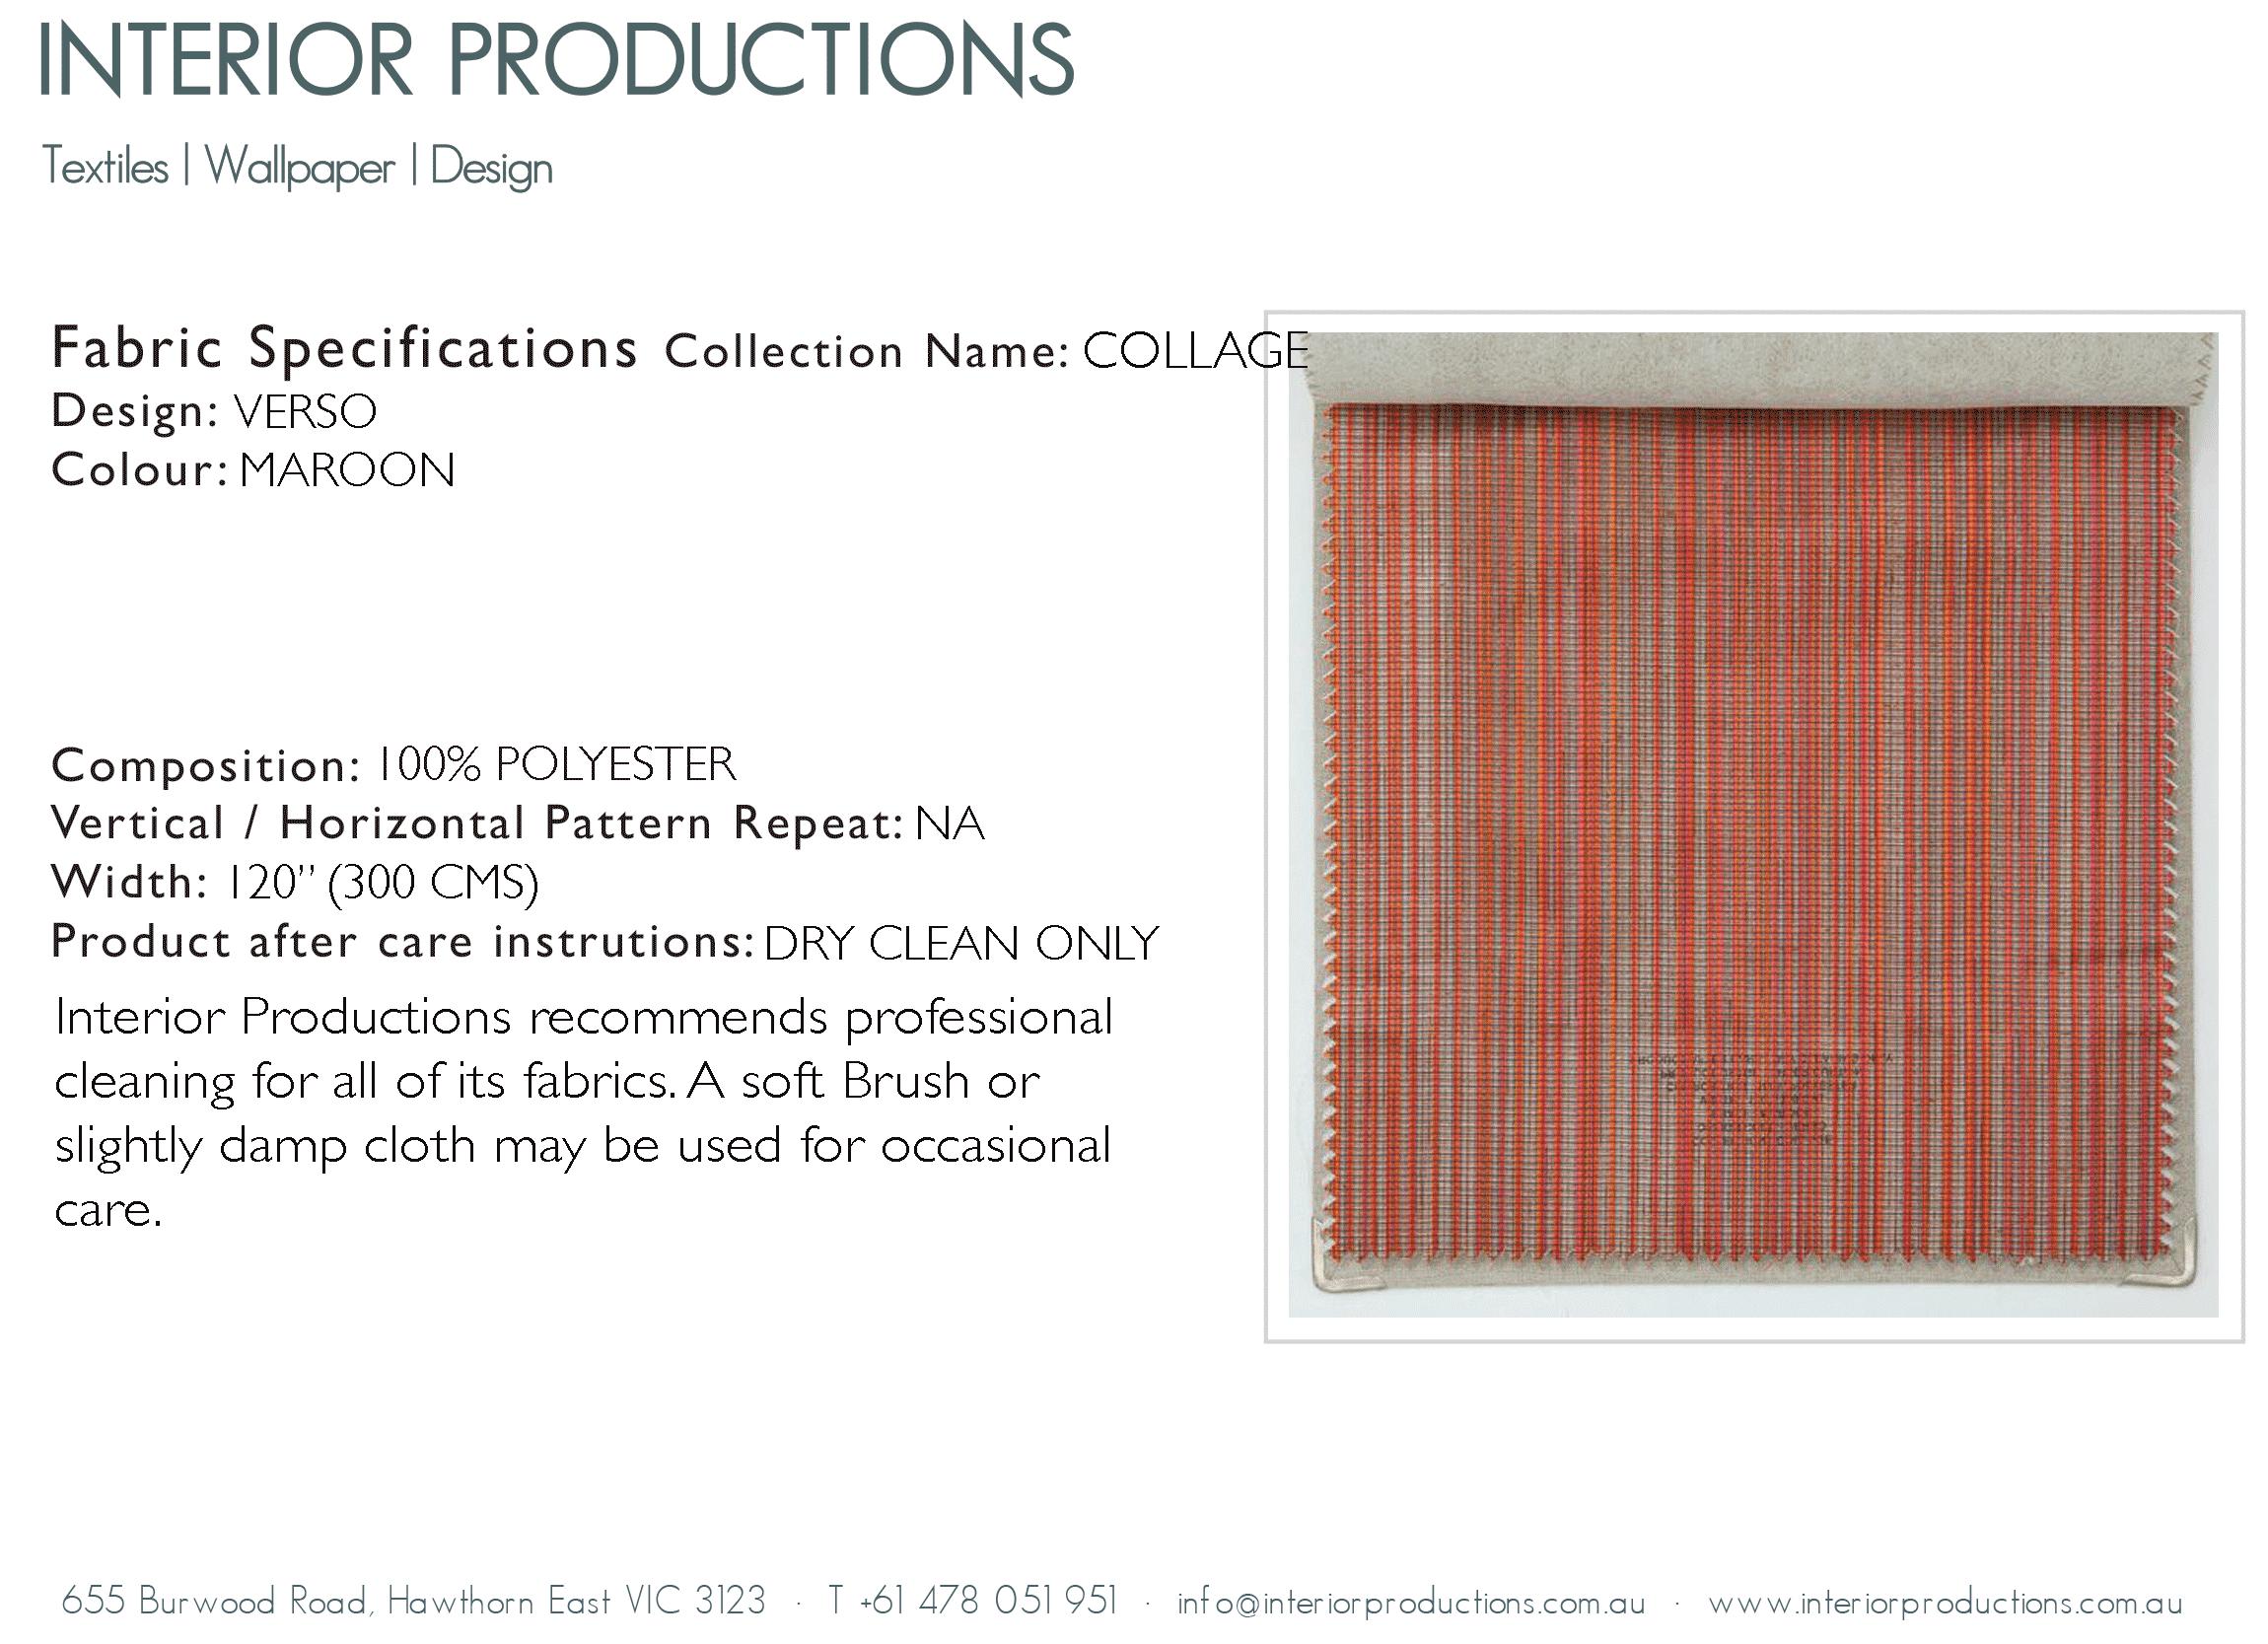 interior_productions_VERSO---MAROON